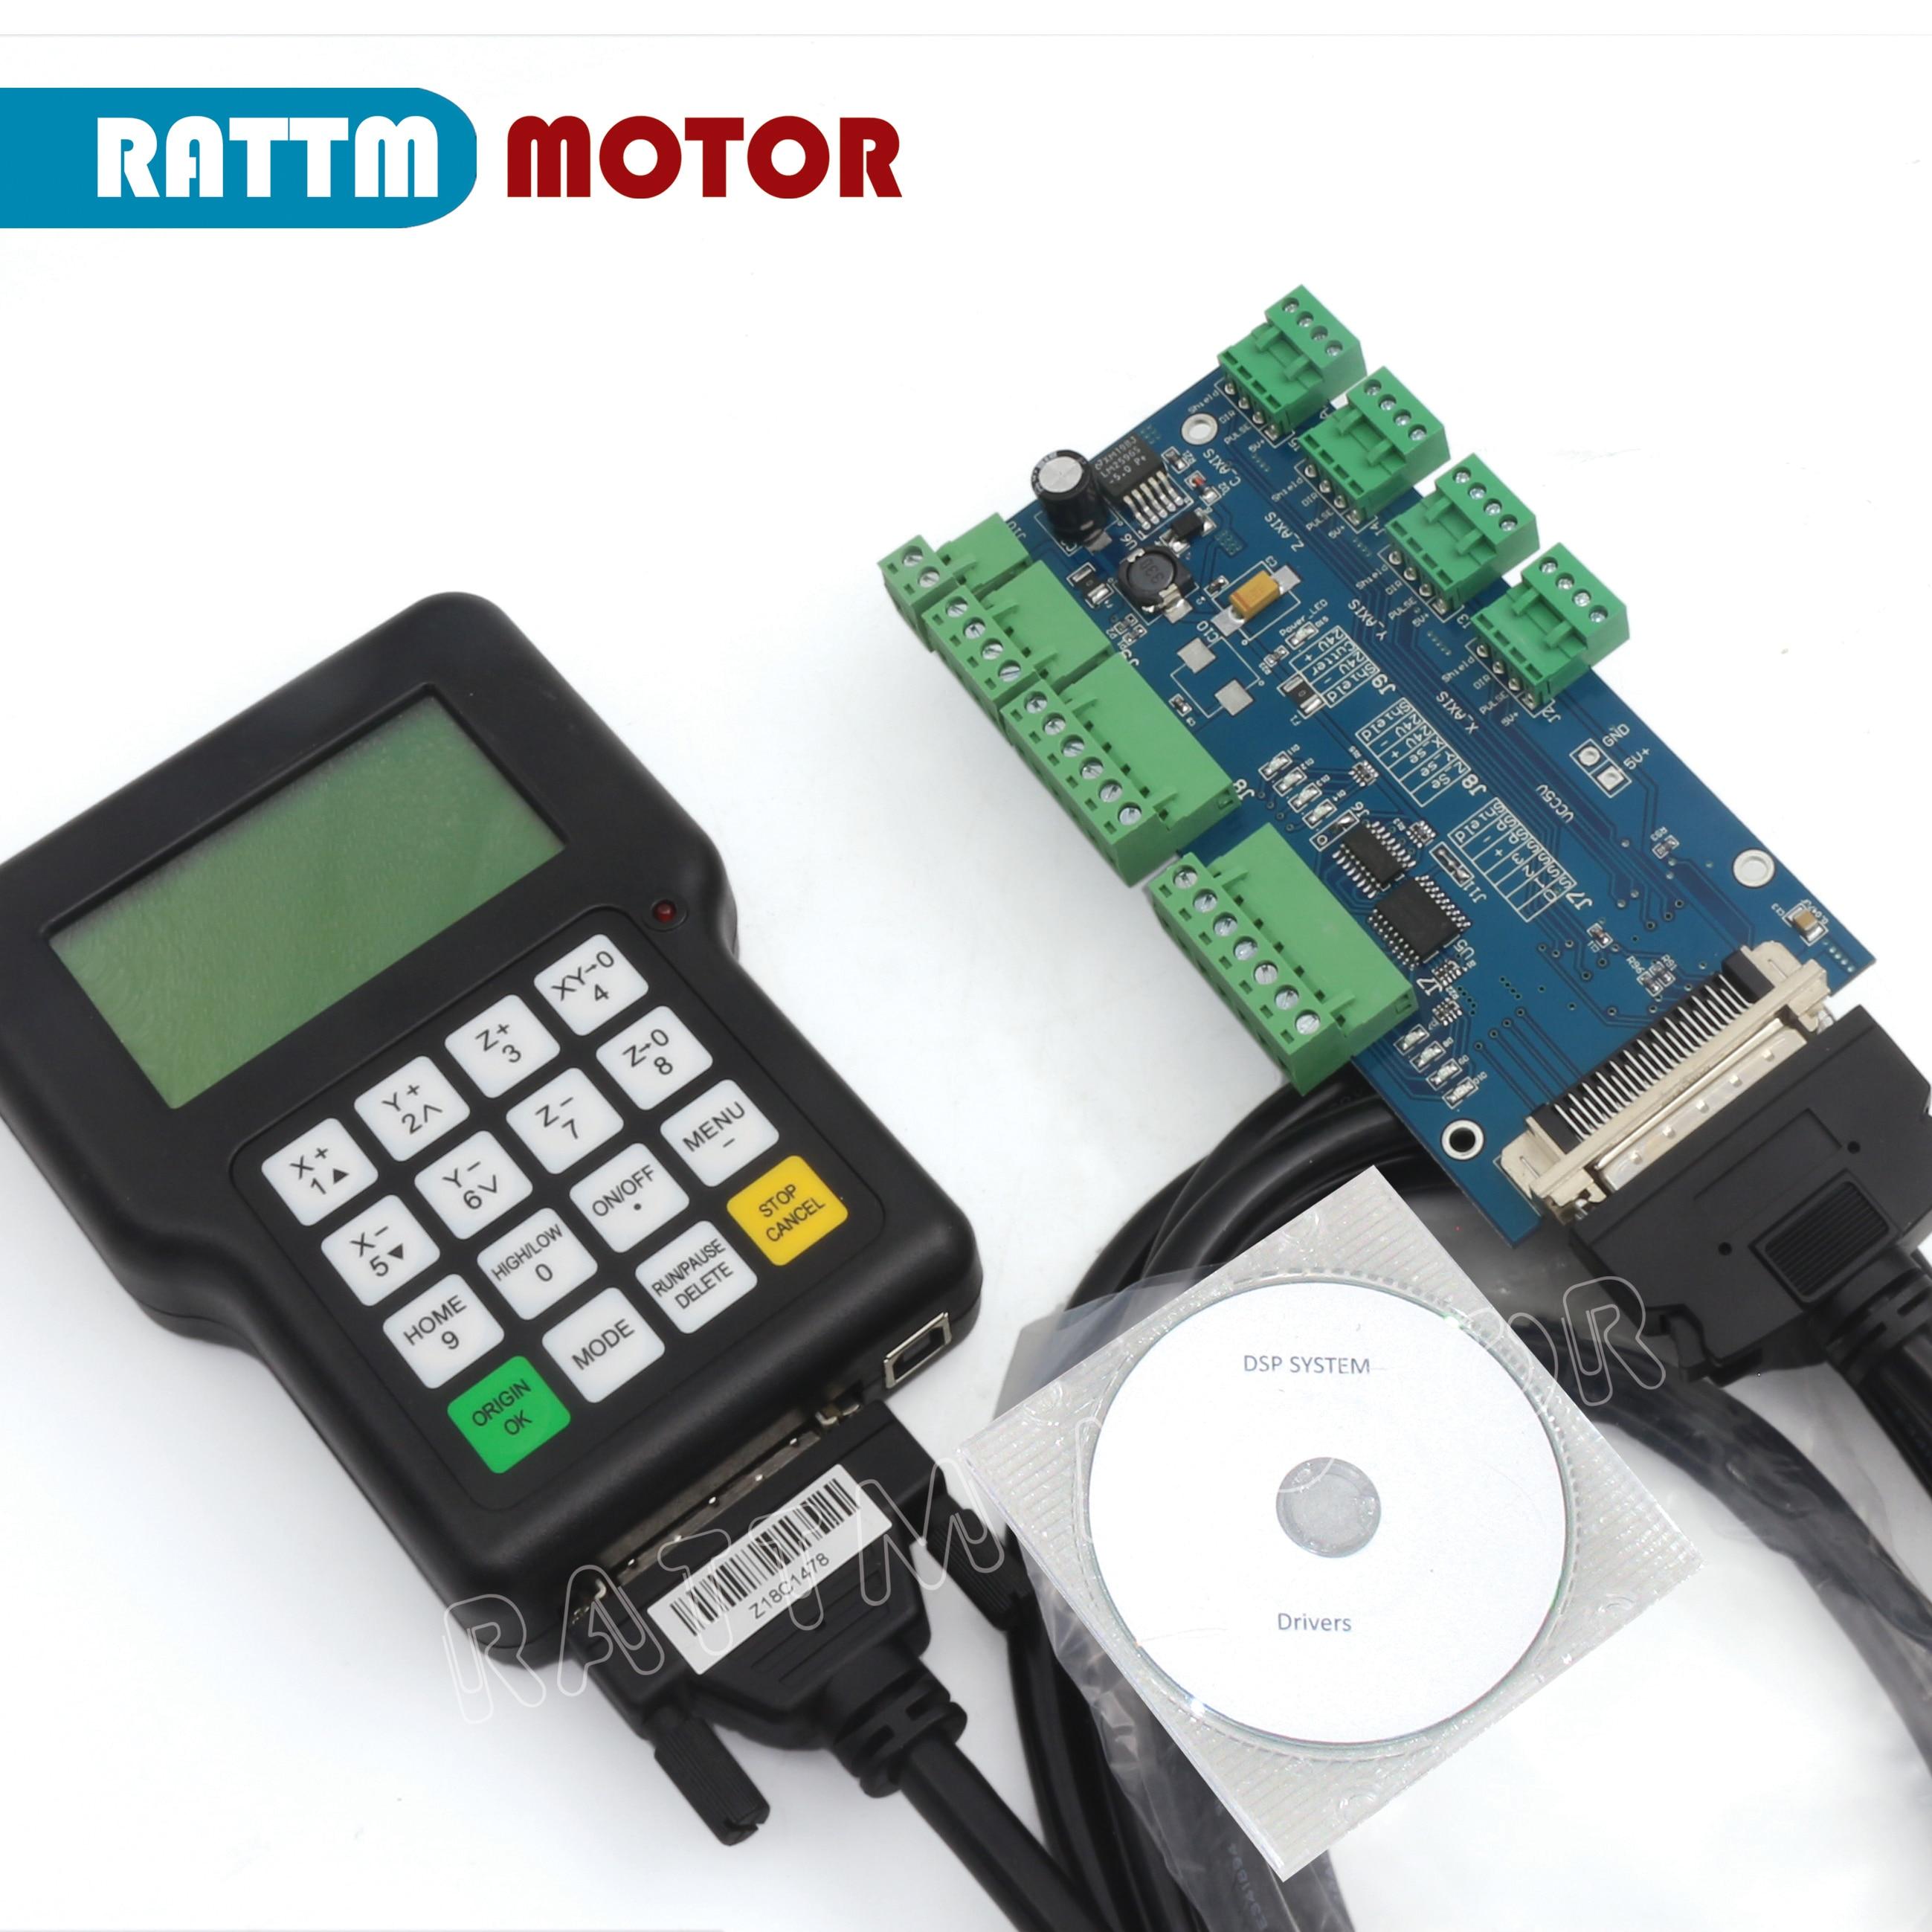 EU Lieferung!! 3 achsen DSP Griff controller A11 0501 CNC Router Maschine für CNC router/cnc stecher 3 achsen CNC router fernbedienung